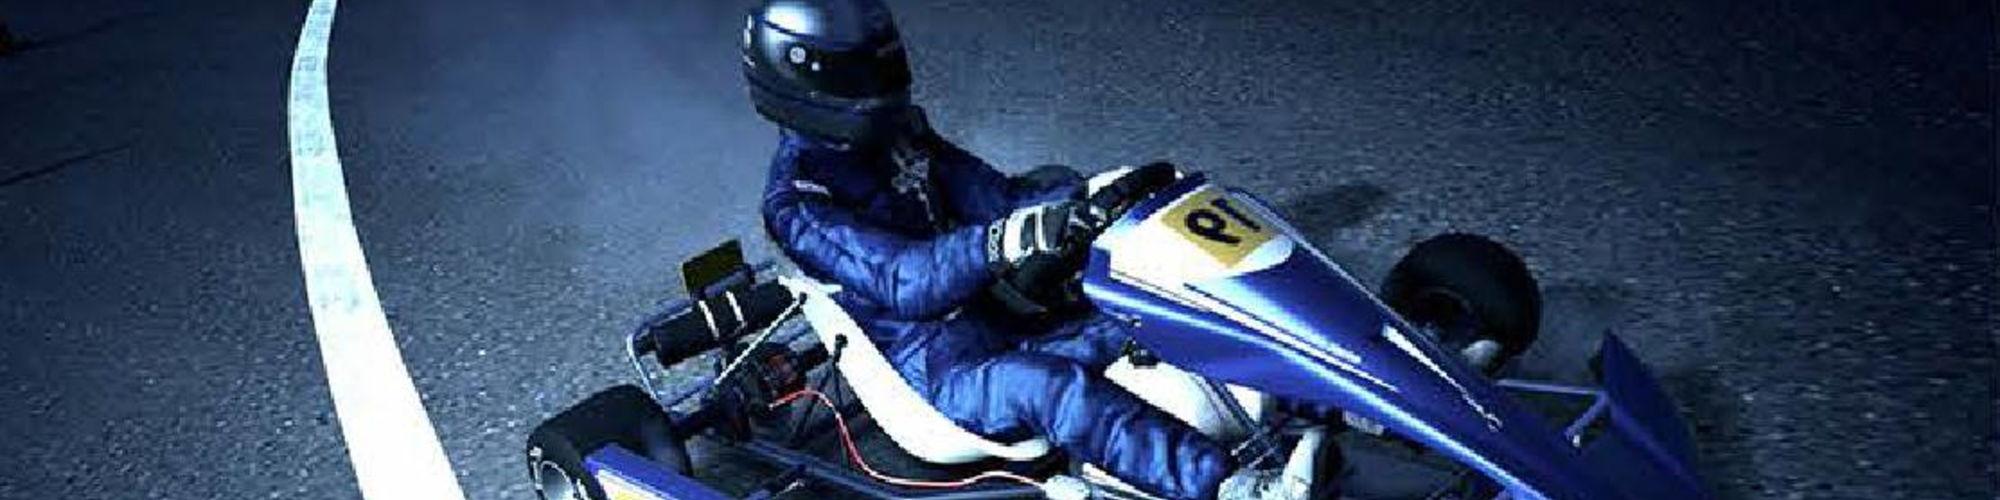 DOOS Karting